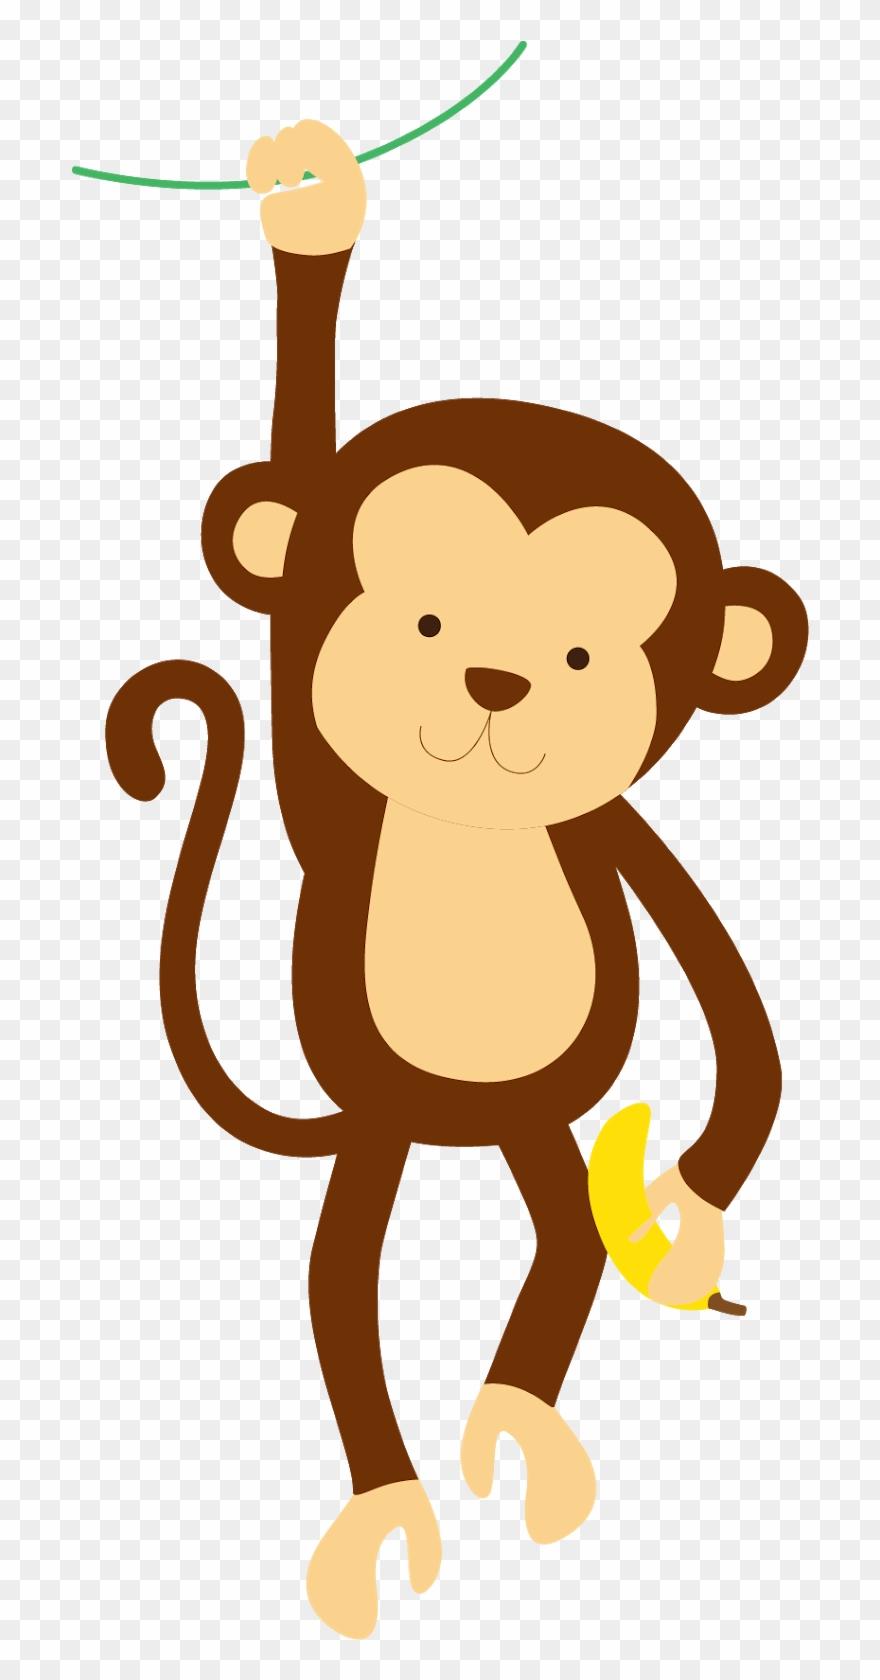 Chimpanzee Cartoon Clip Art.